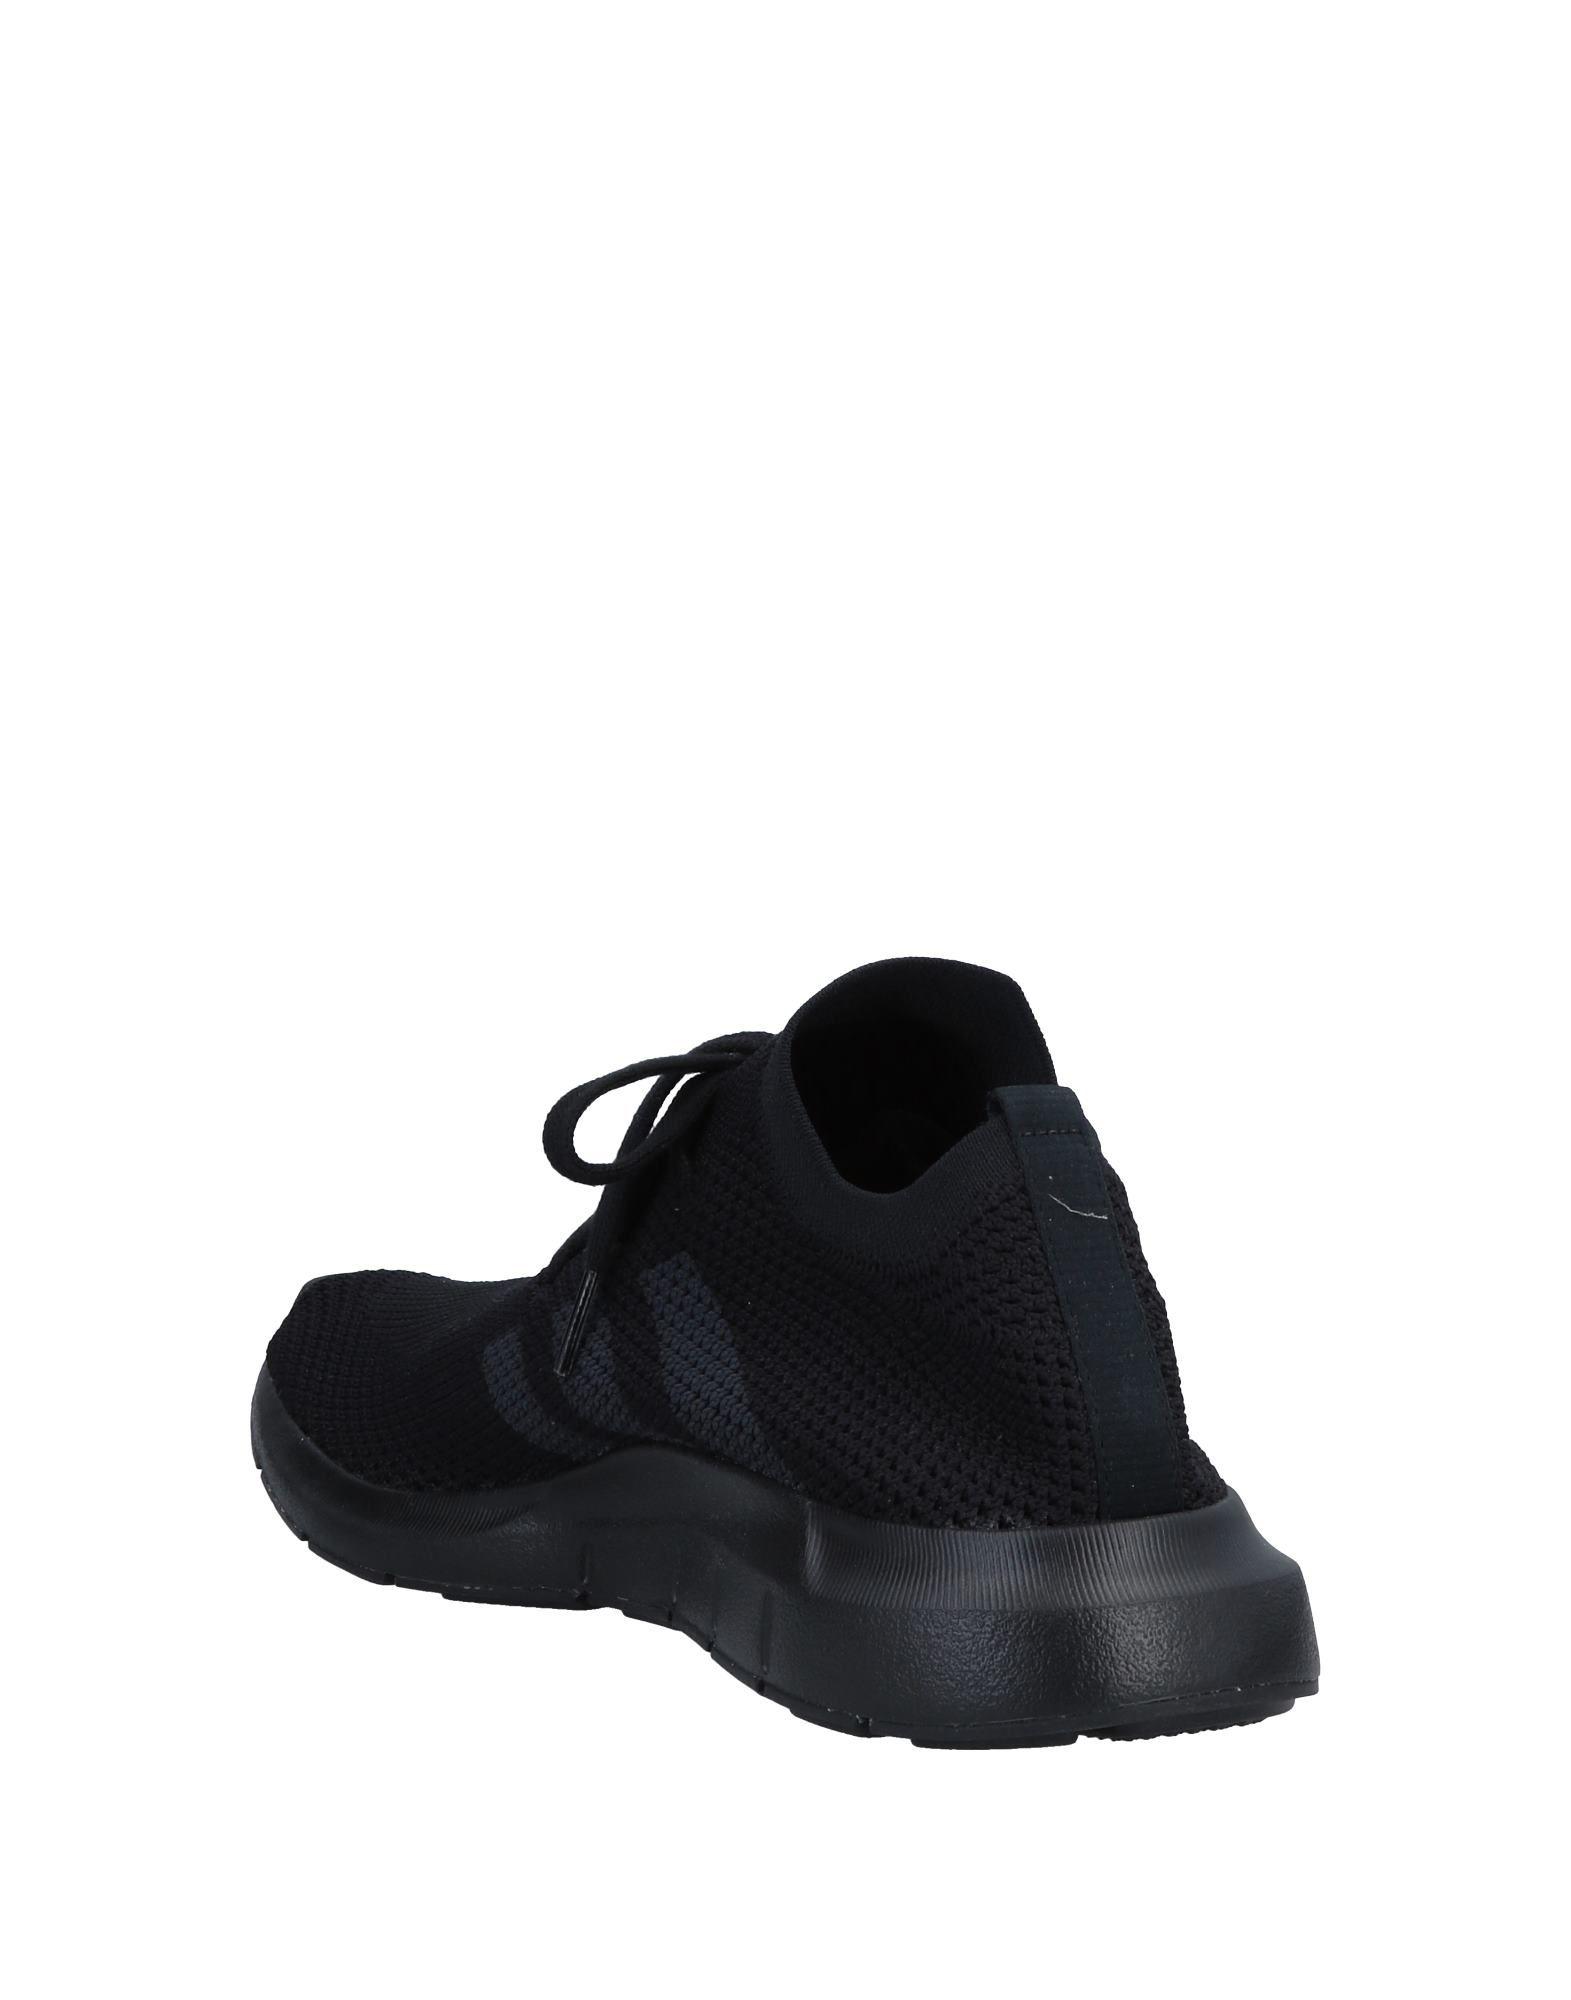 Adidas Originals Sneakers - Men Adidas  Originals Sneakers online on  Adidas United Kingdom - 11563983GW 402c50